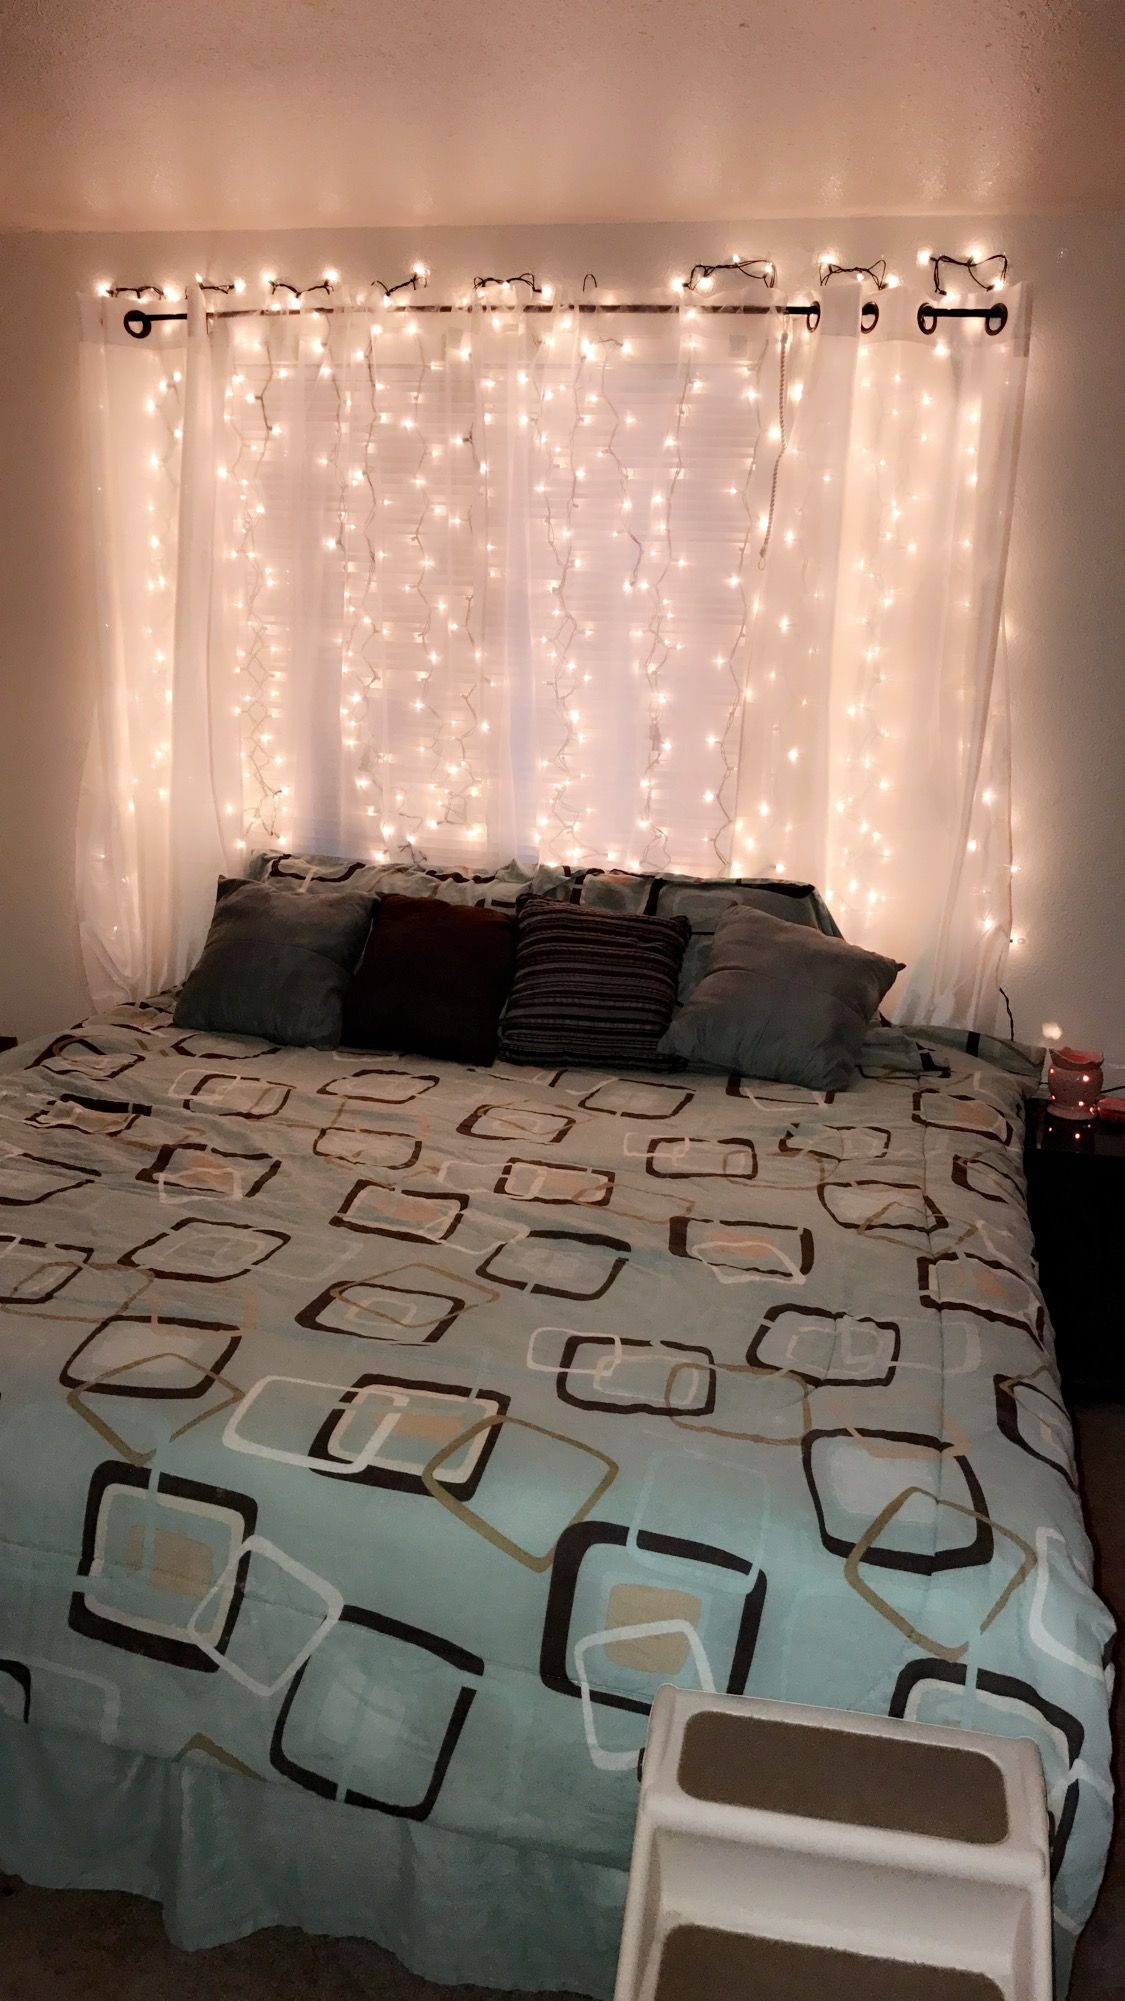 Light Up Curtain Headboard Diy King Bed 2 Boxes 300 Lights Each 7 50 A Box Walmart Com Diy King Headboard Diy Home Decor Bedroom Girl Headboard Curtains